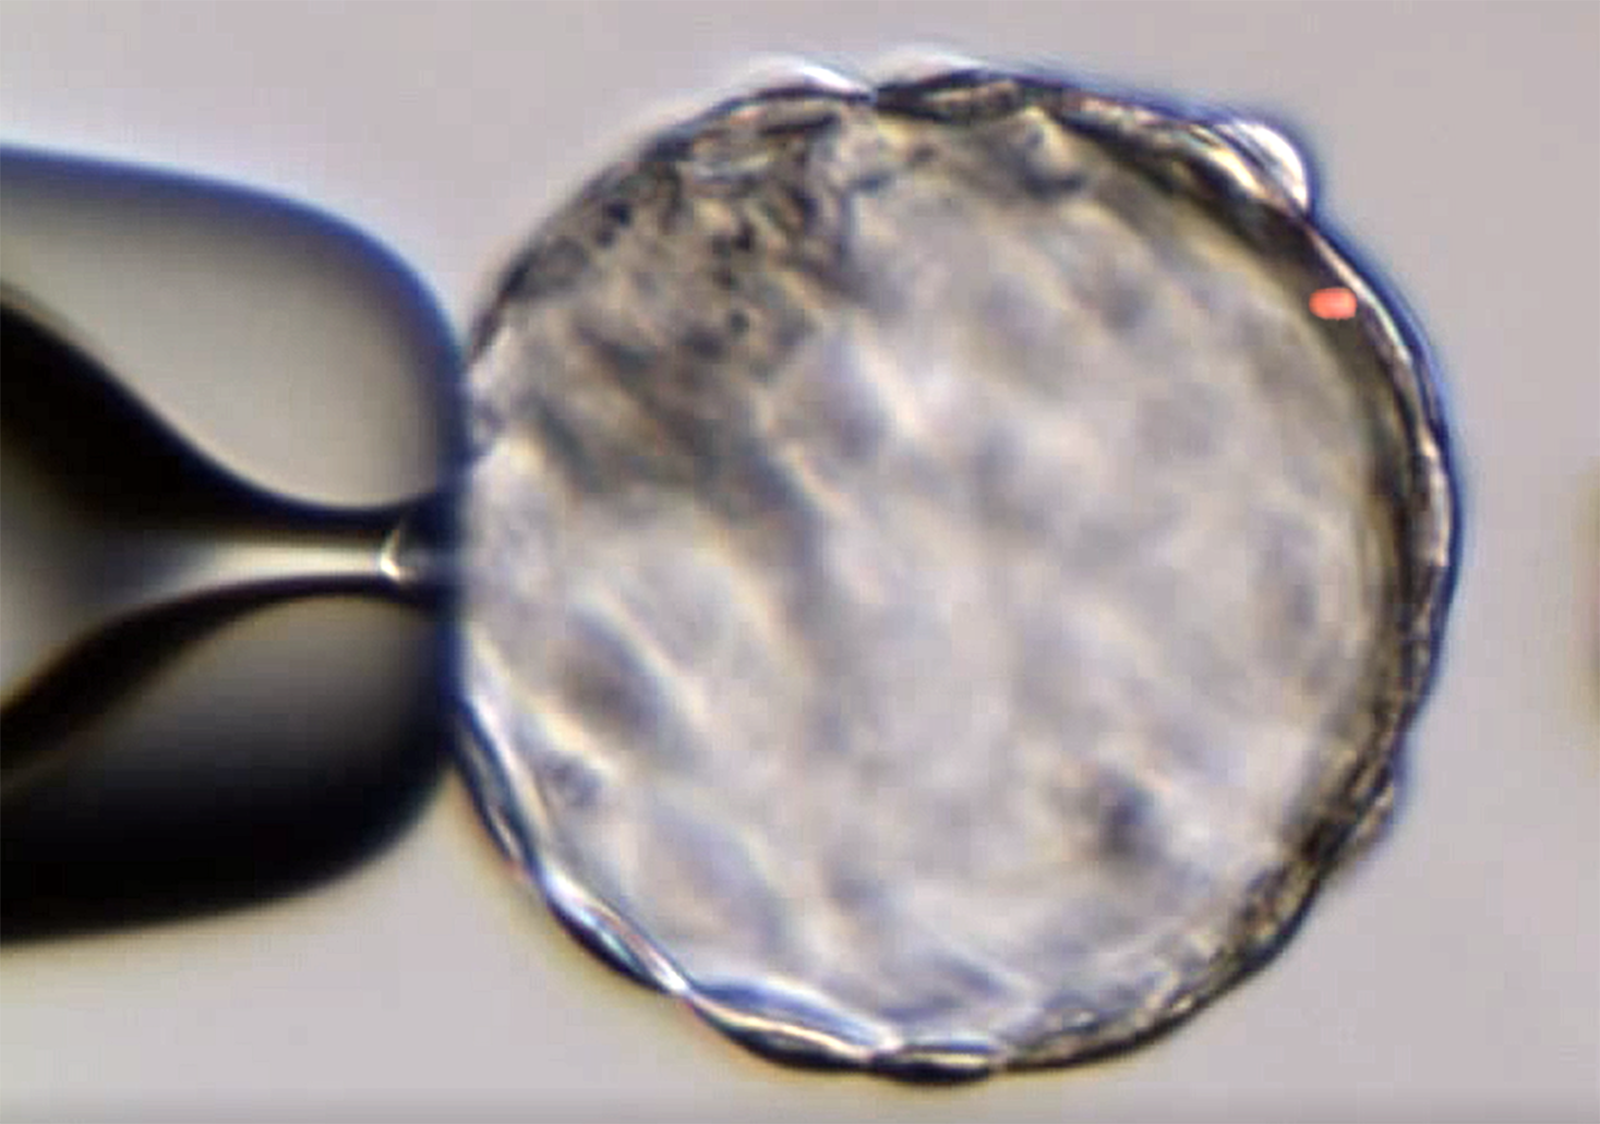 Laser collapsing blastocyst.png